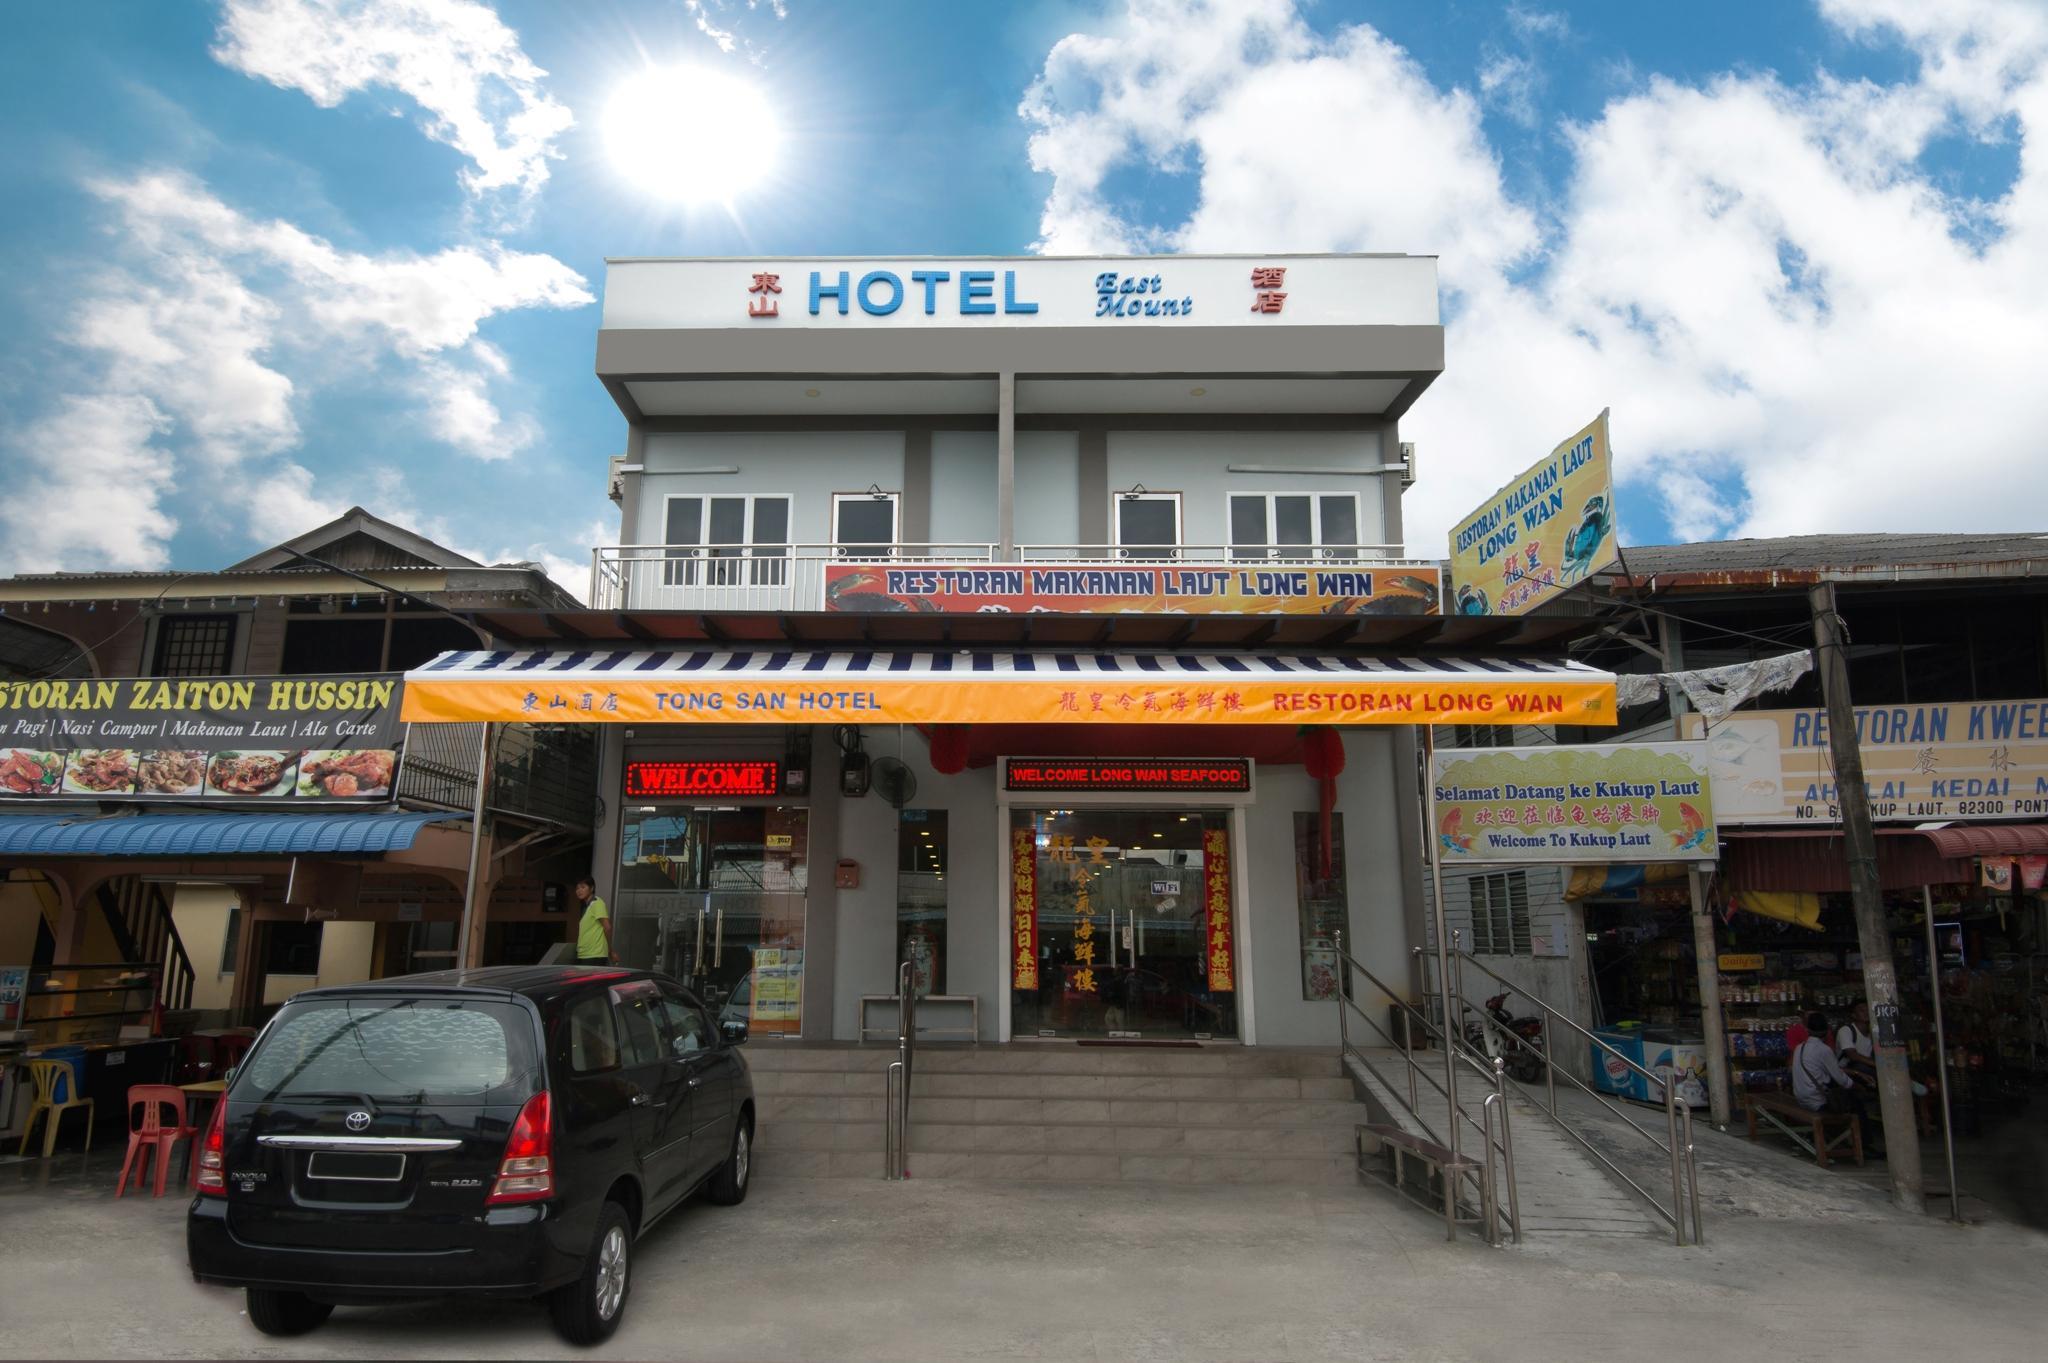 Tong San Hotel